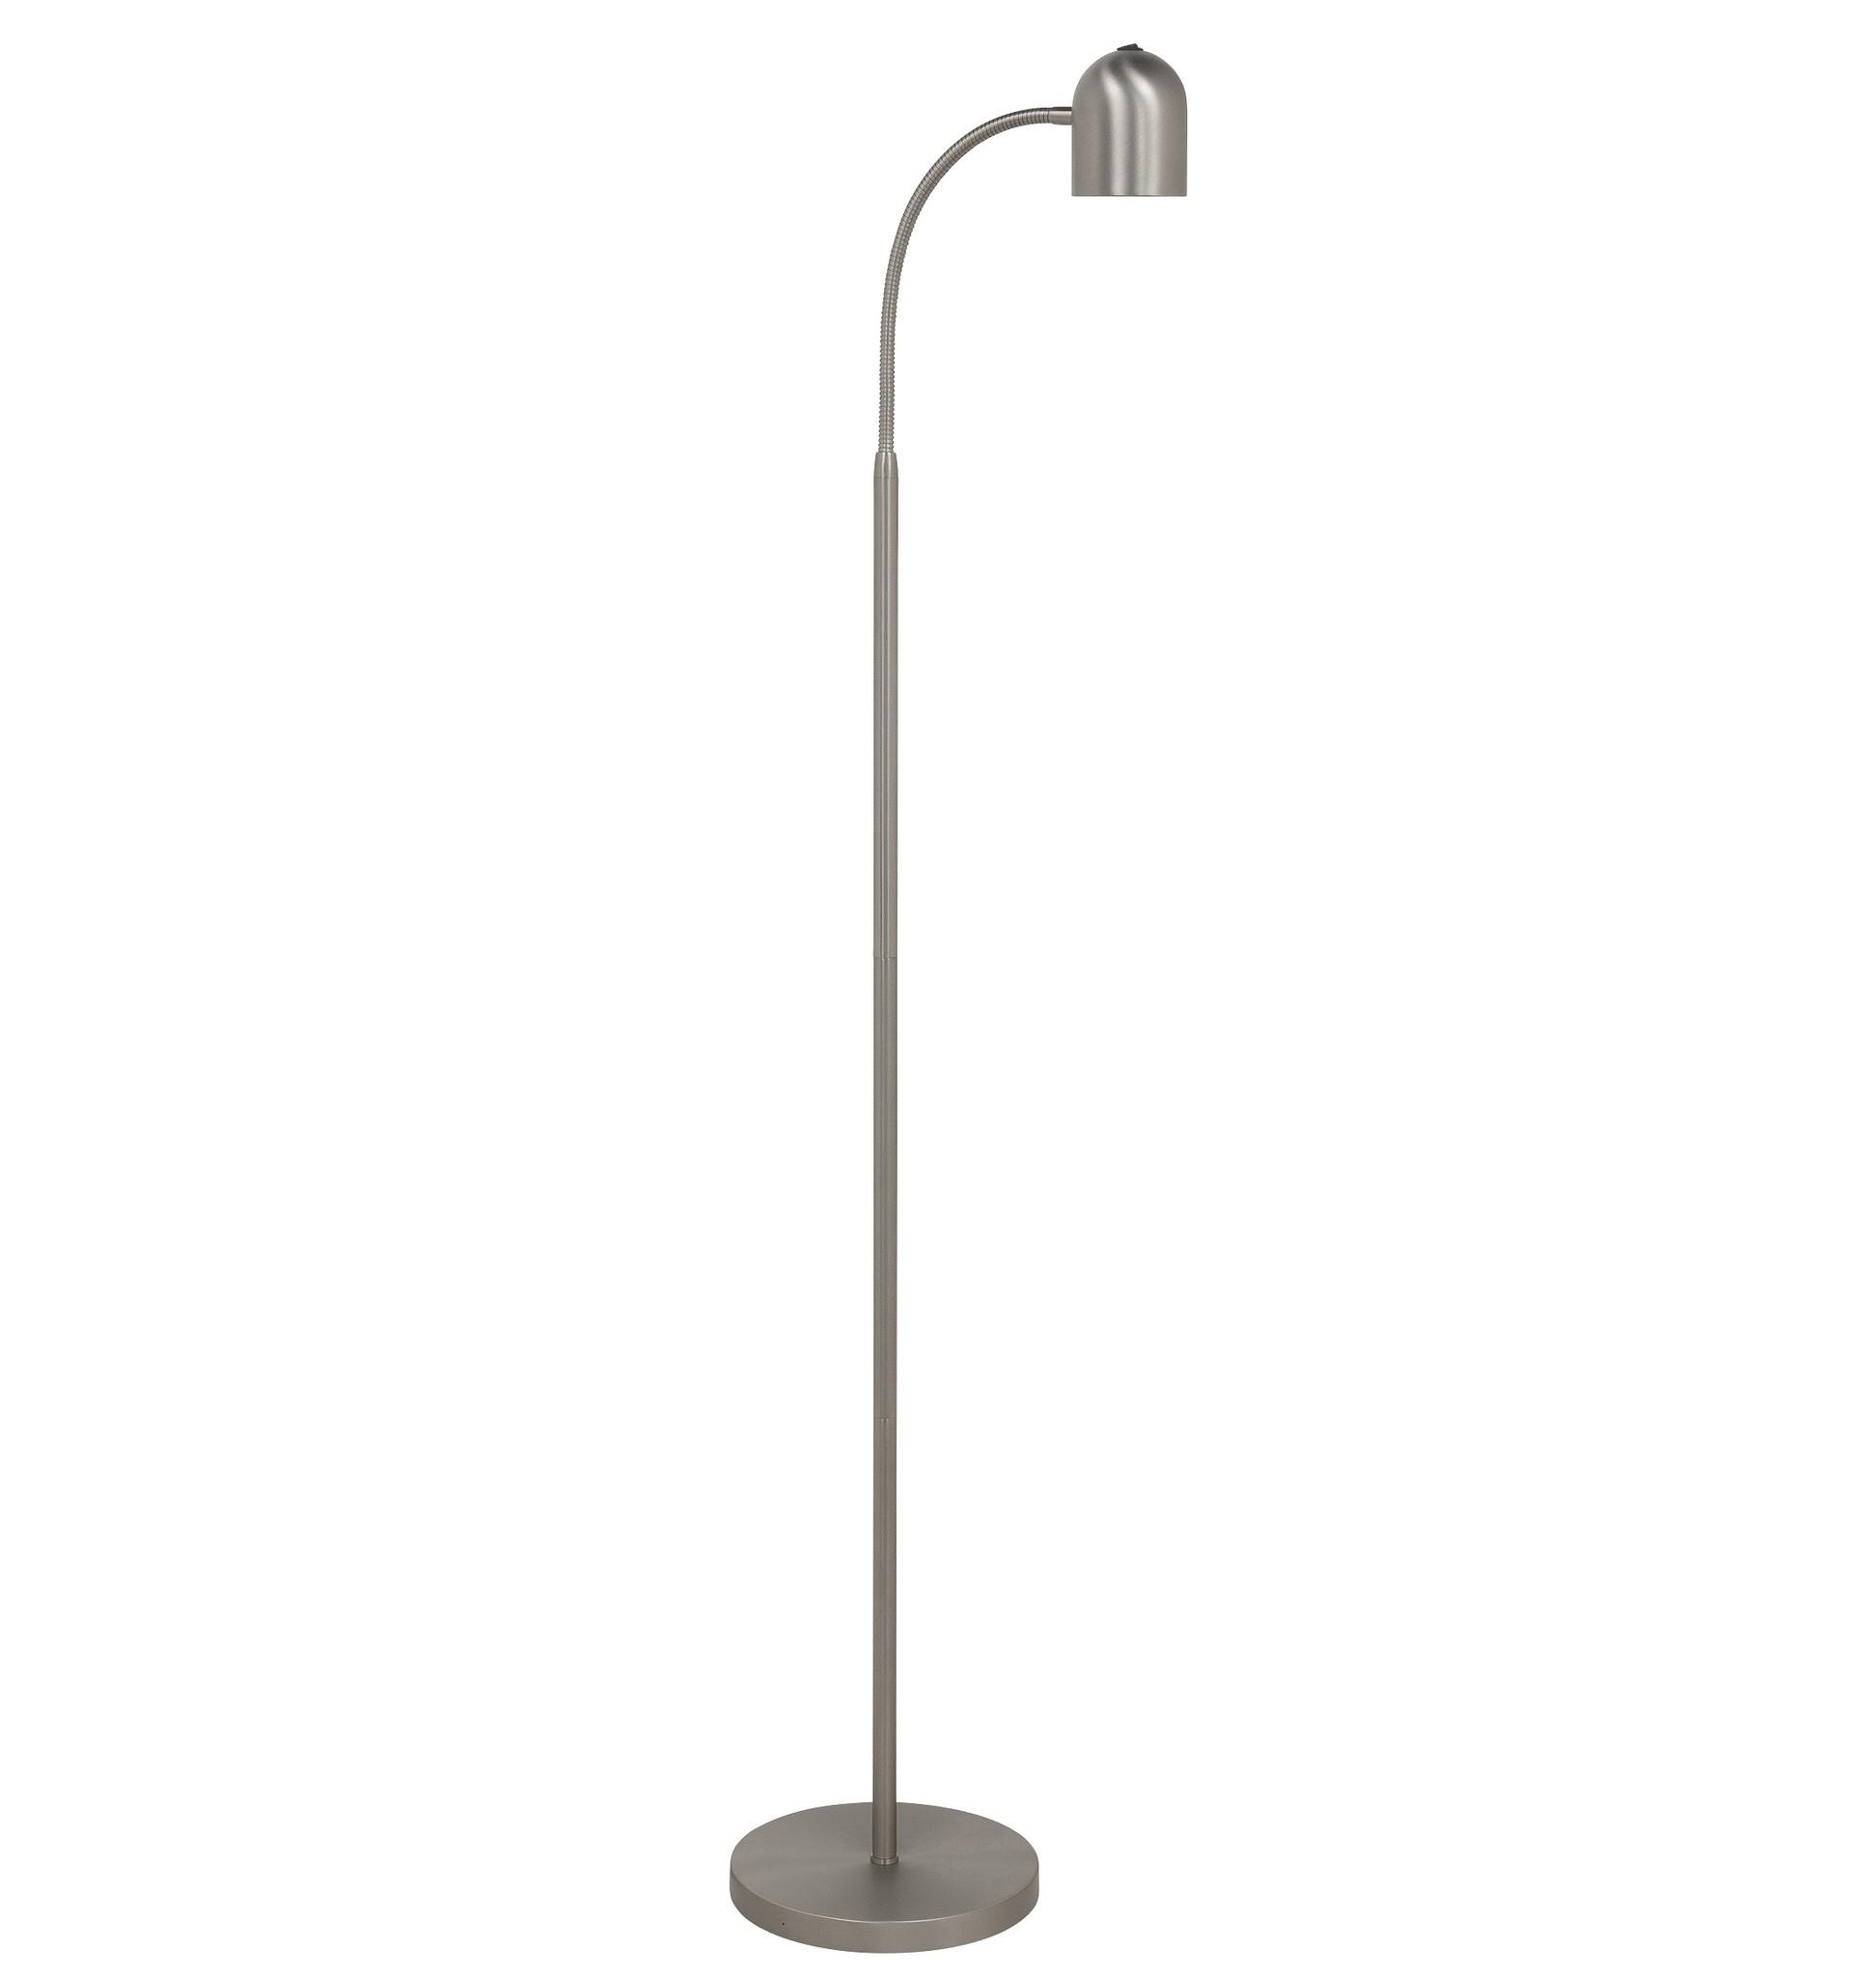 Vloerlamp Umbria RVS Flex LED